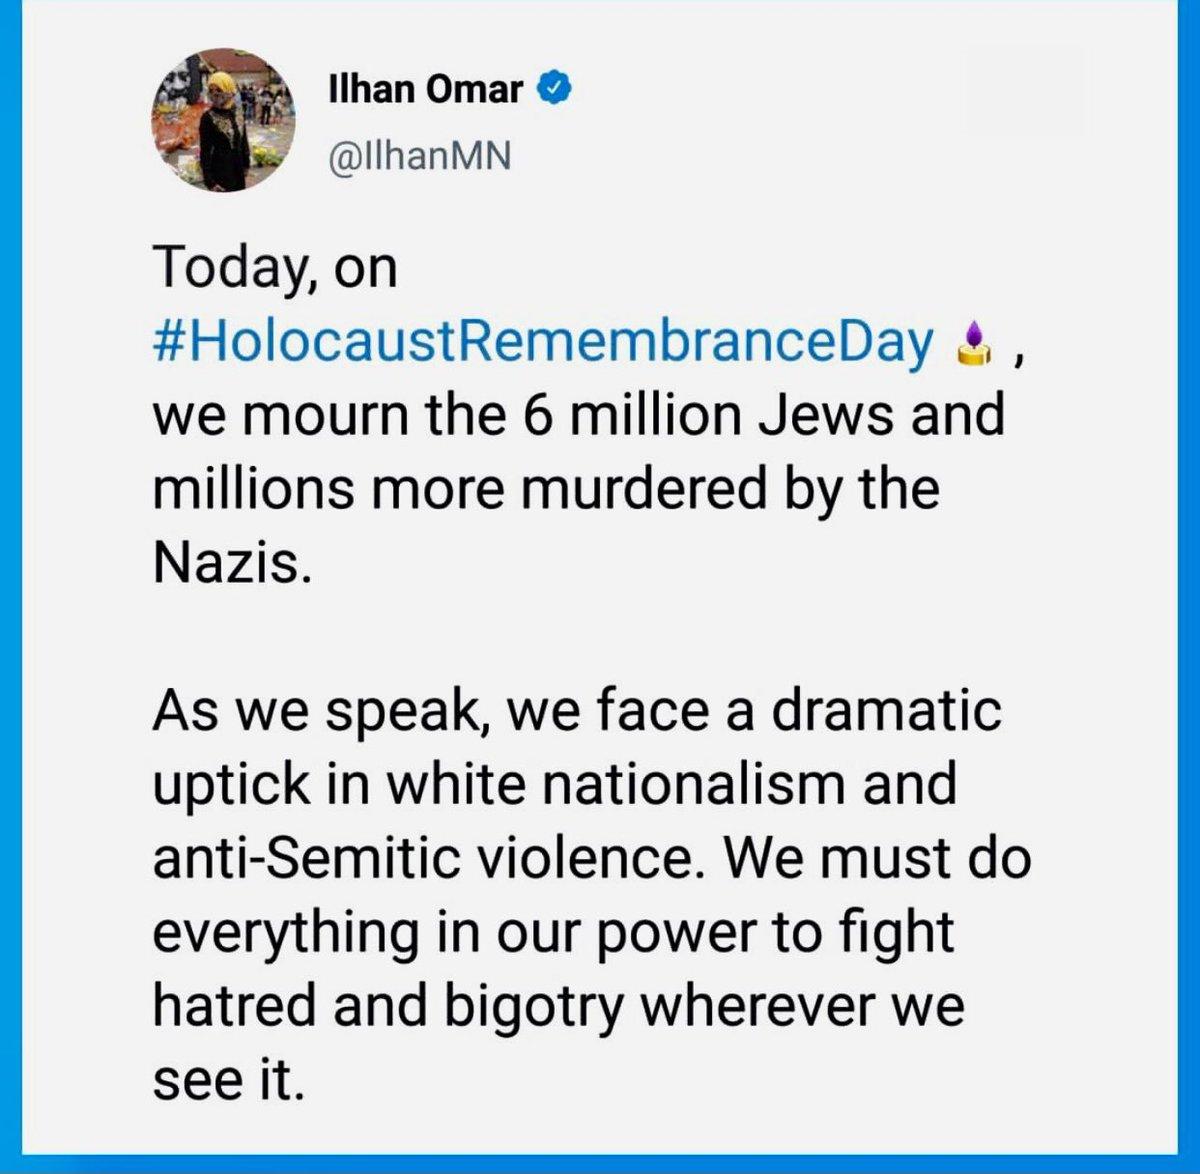 #HolocaustRemembranceDay #NeverForget